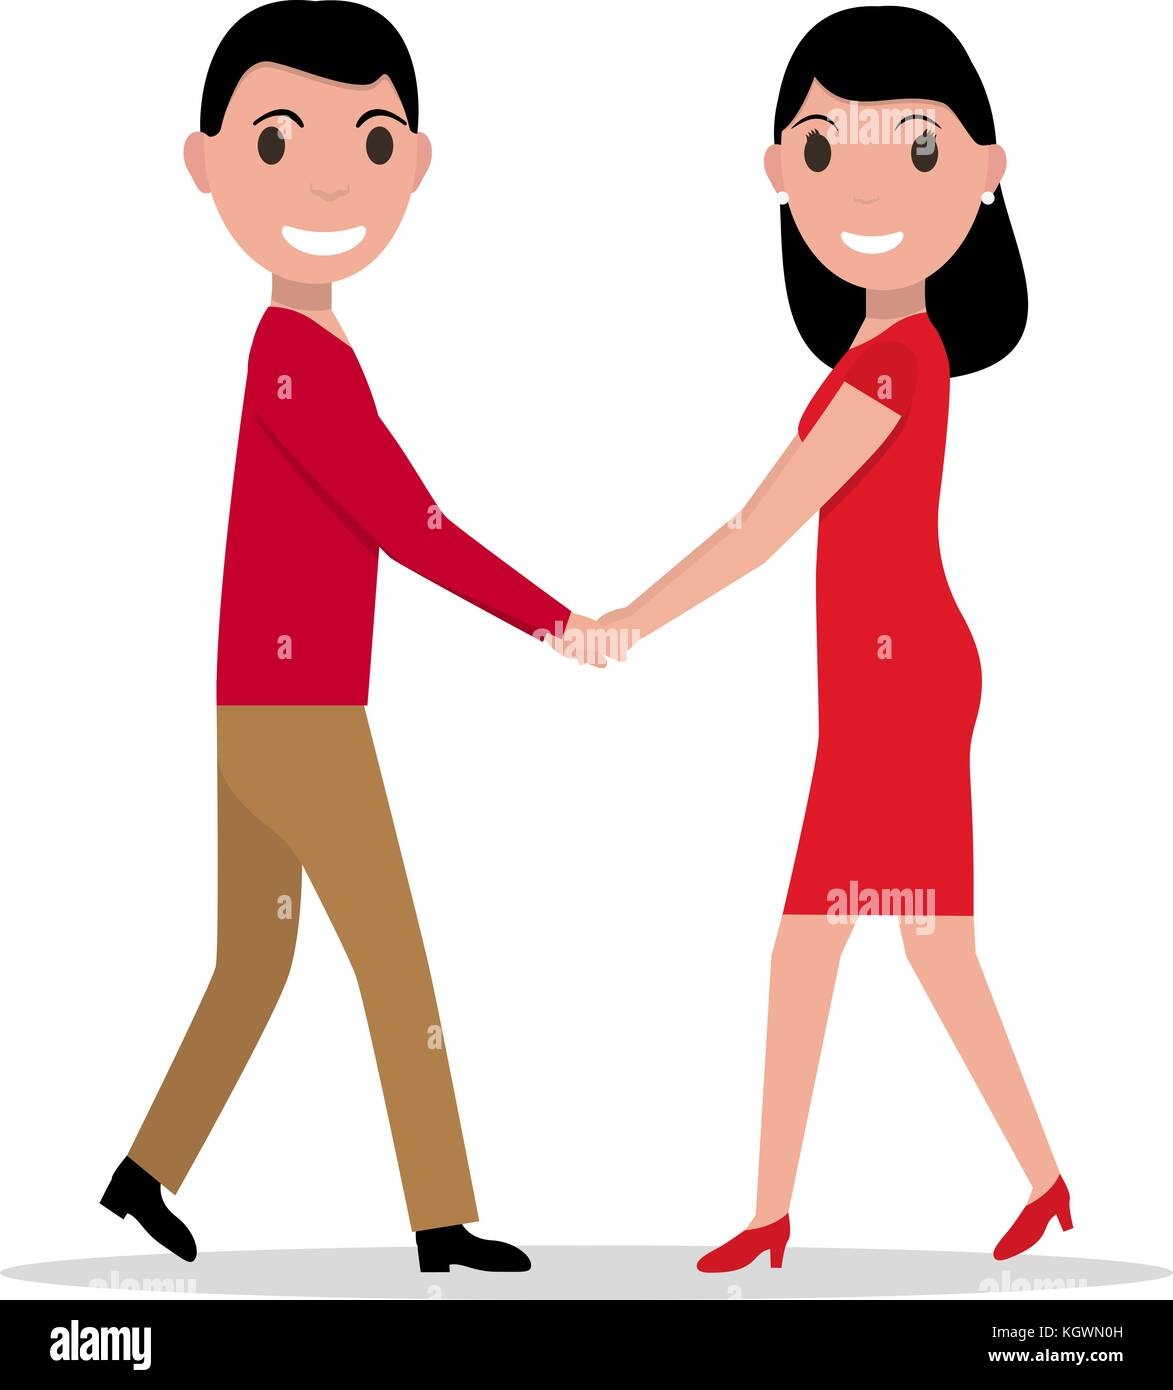 Vector illustration of a cartoon couple in love - Stock Vector